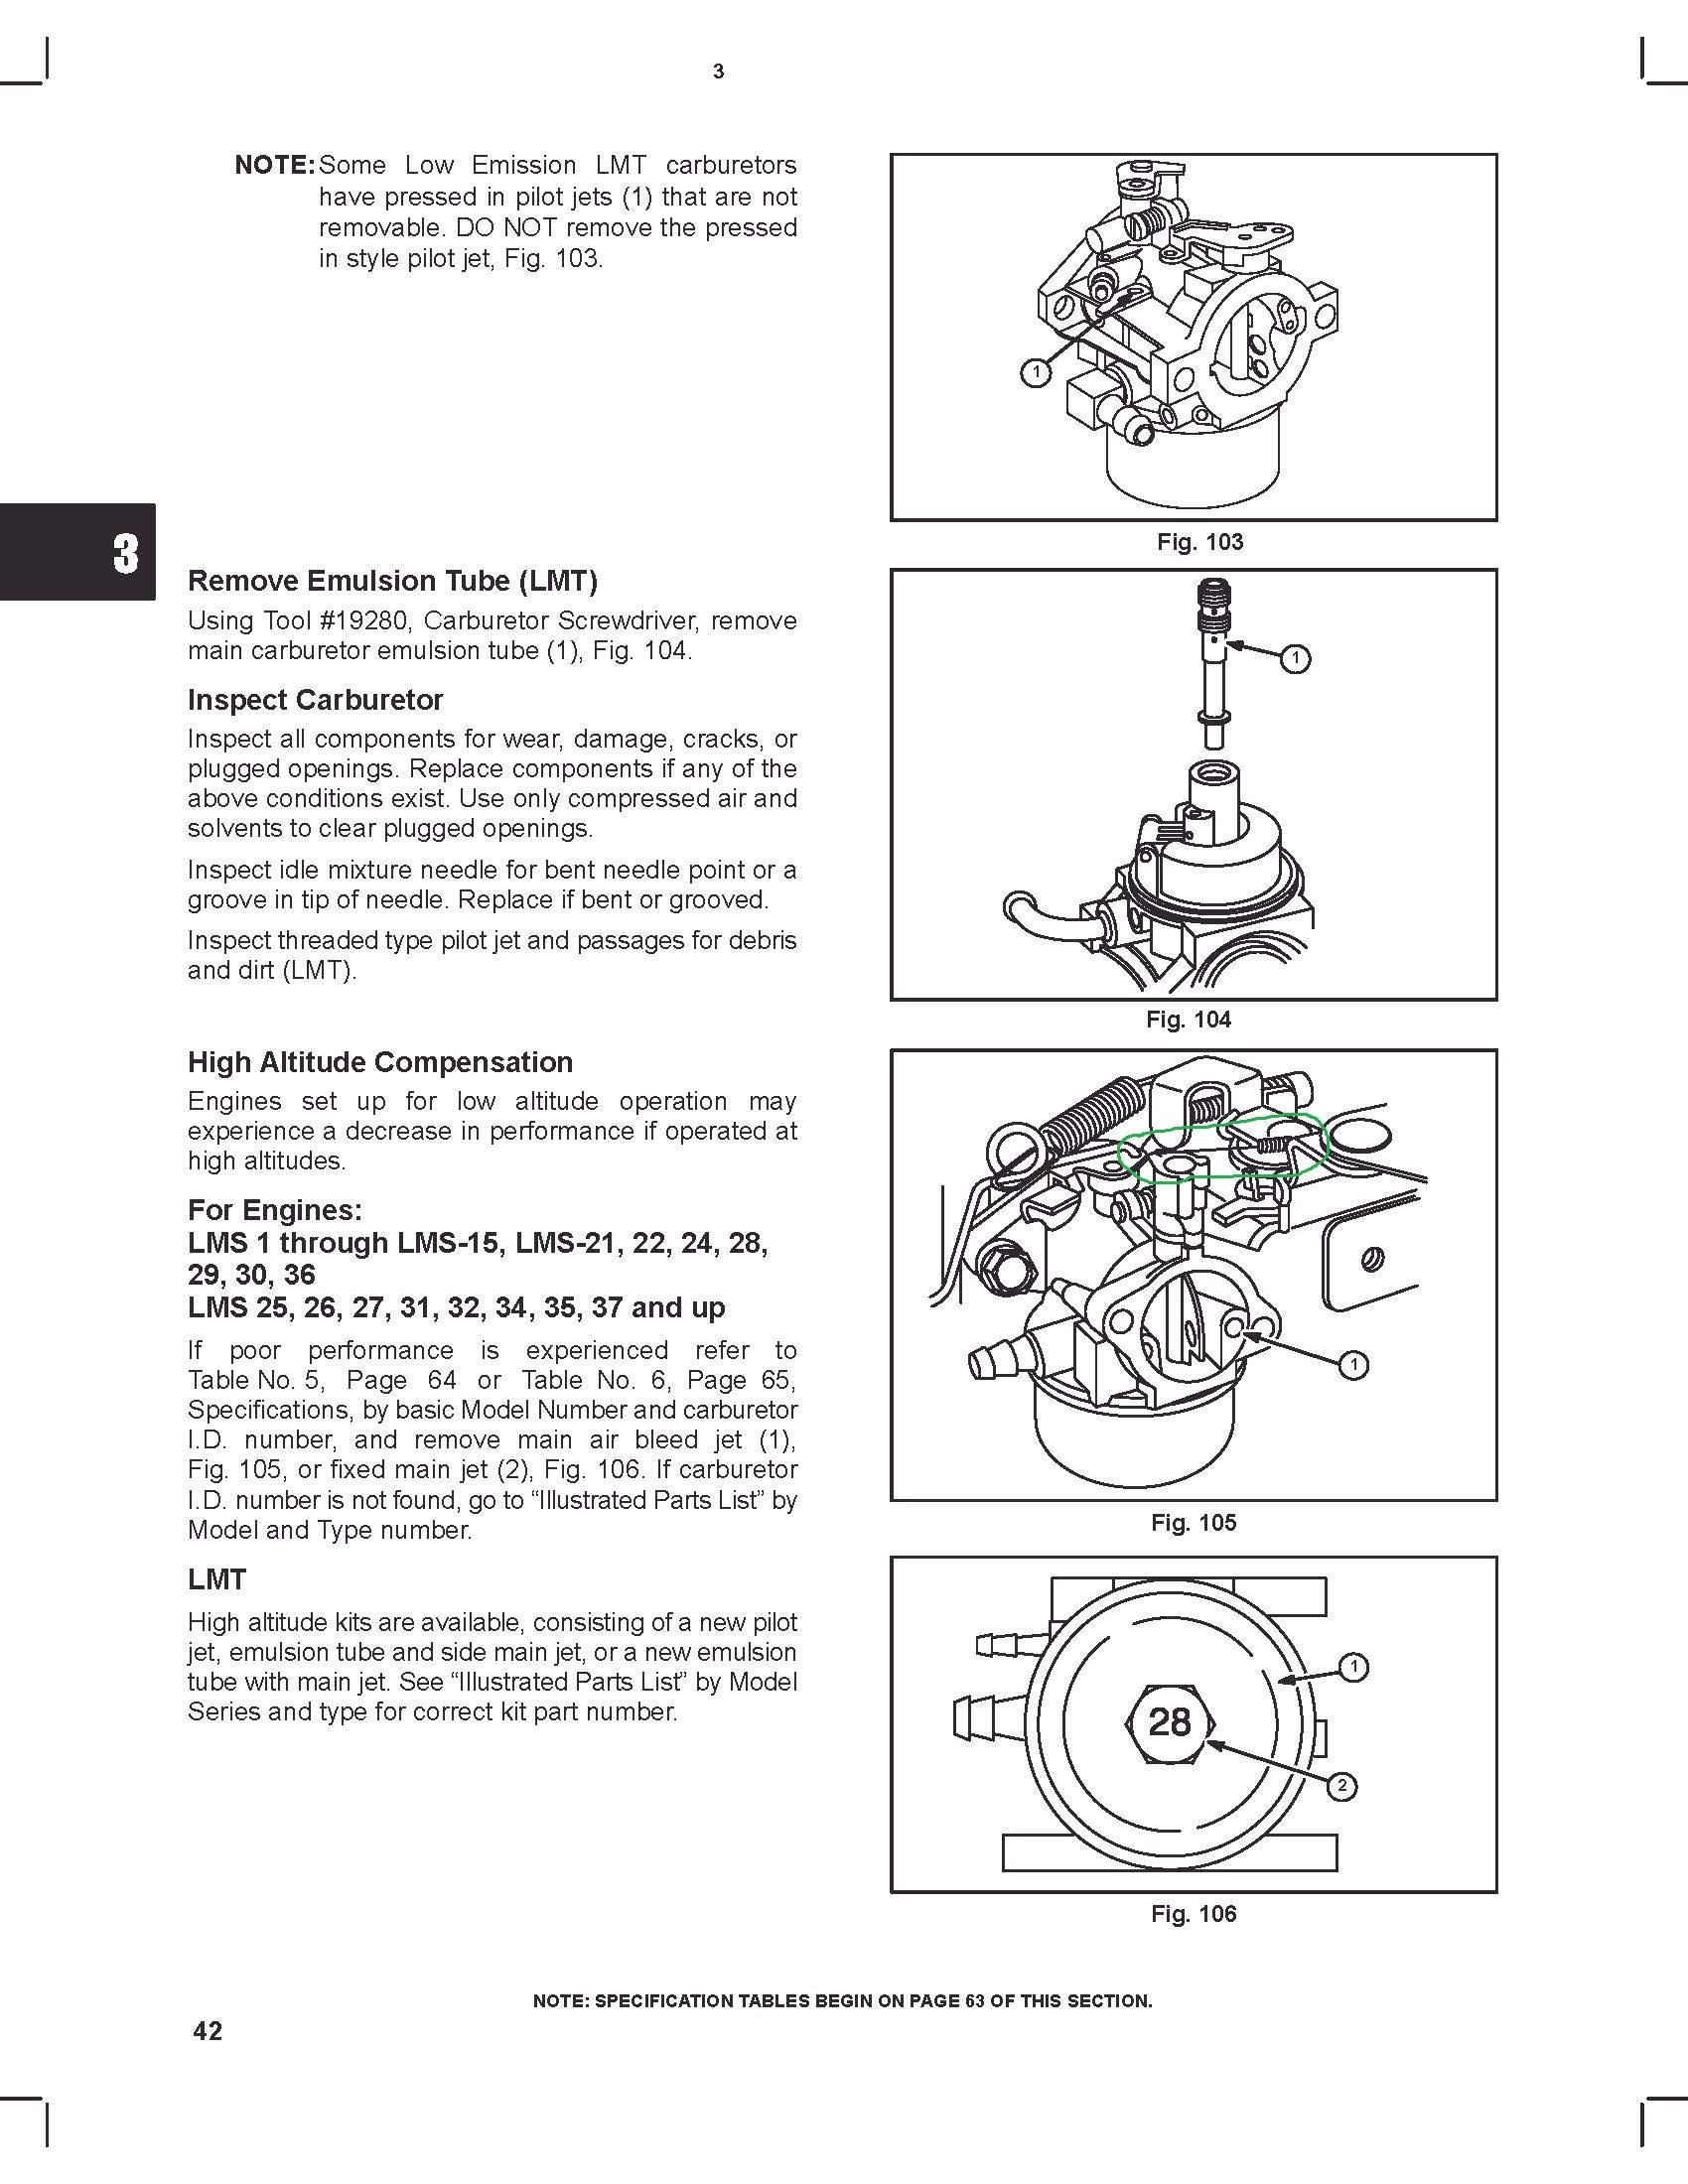 Single Cylinder L Head Briggs Stratton on Briggs And Stratton 8hp Carburetor Diagram